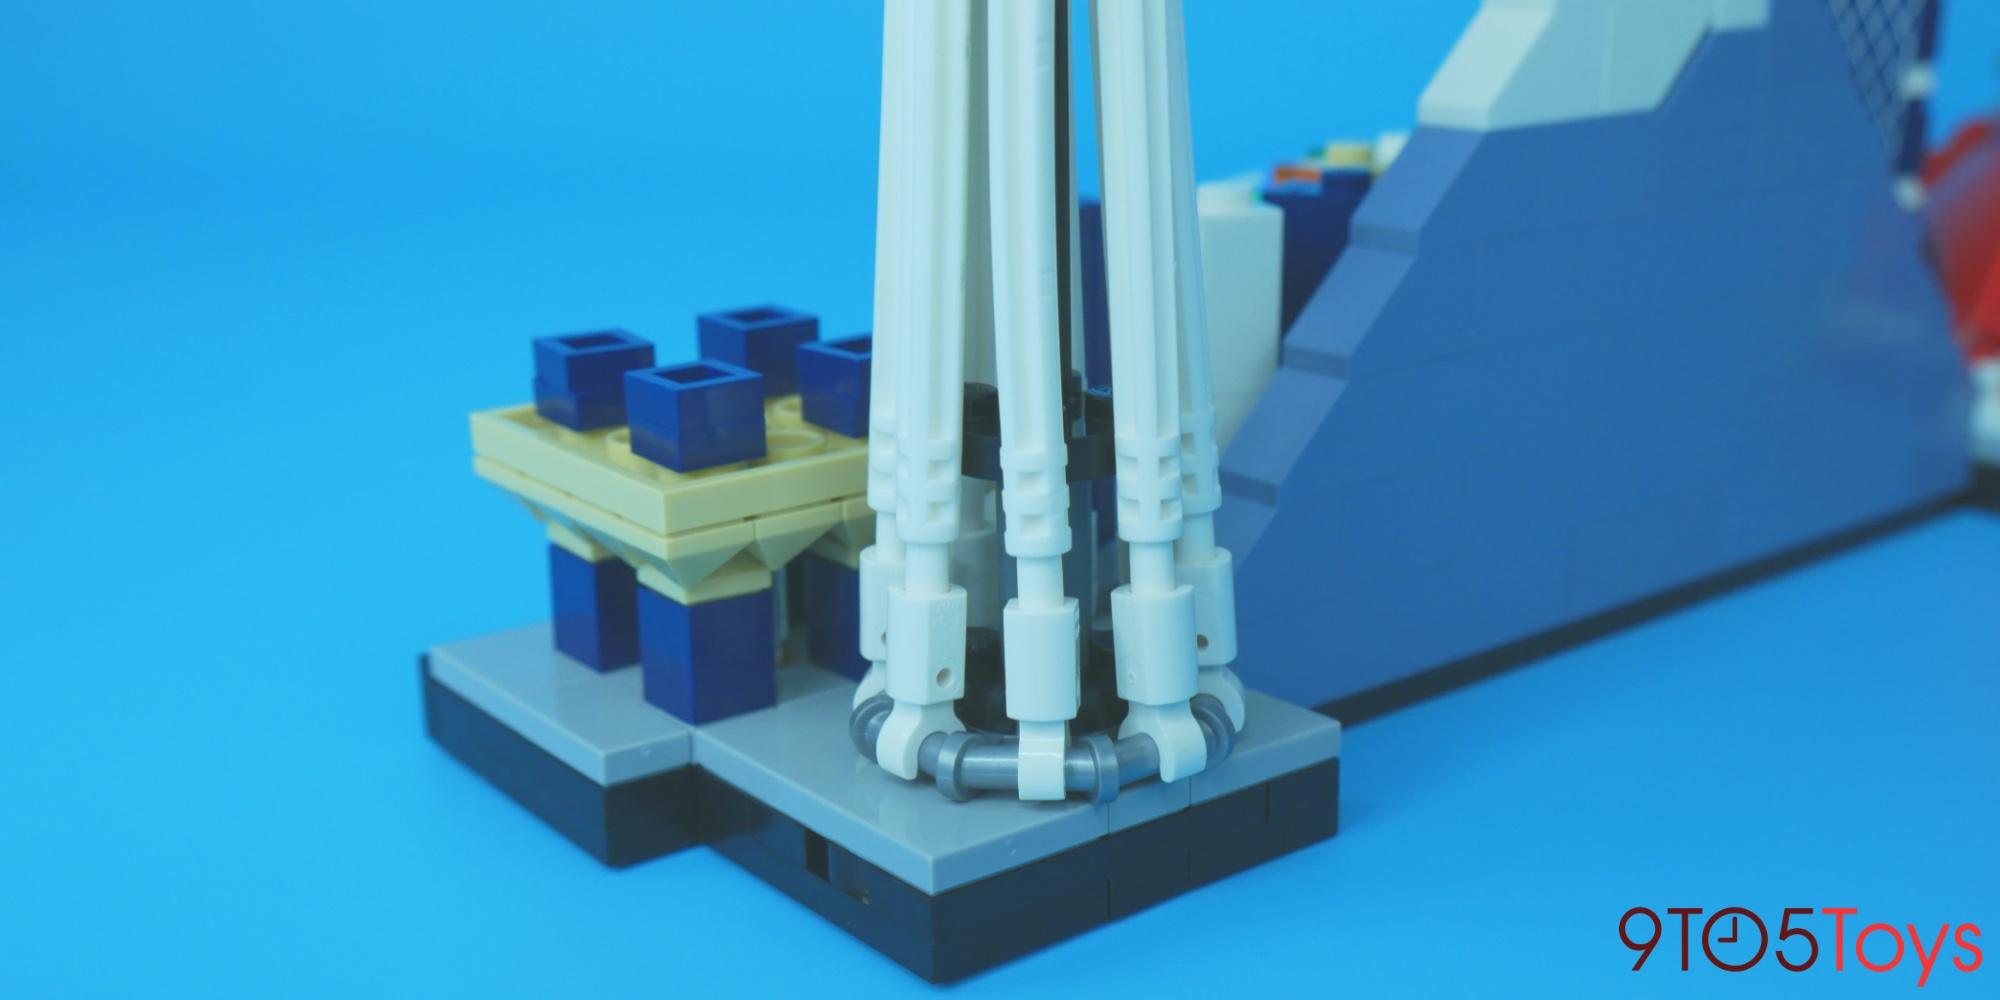 LEGO Tokyo Skyline review